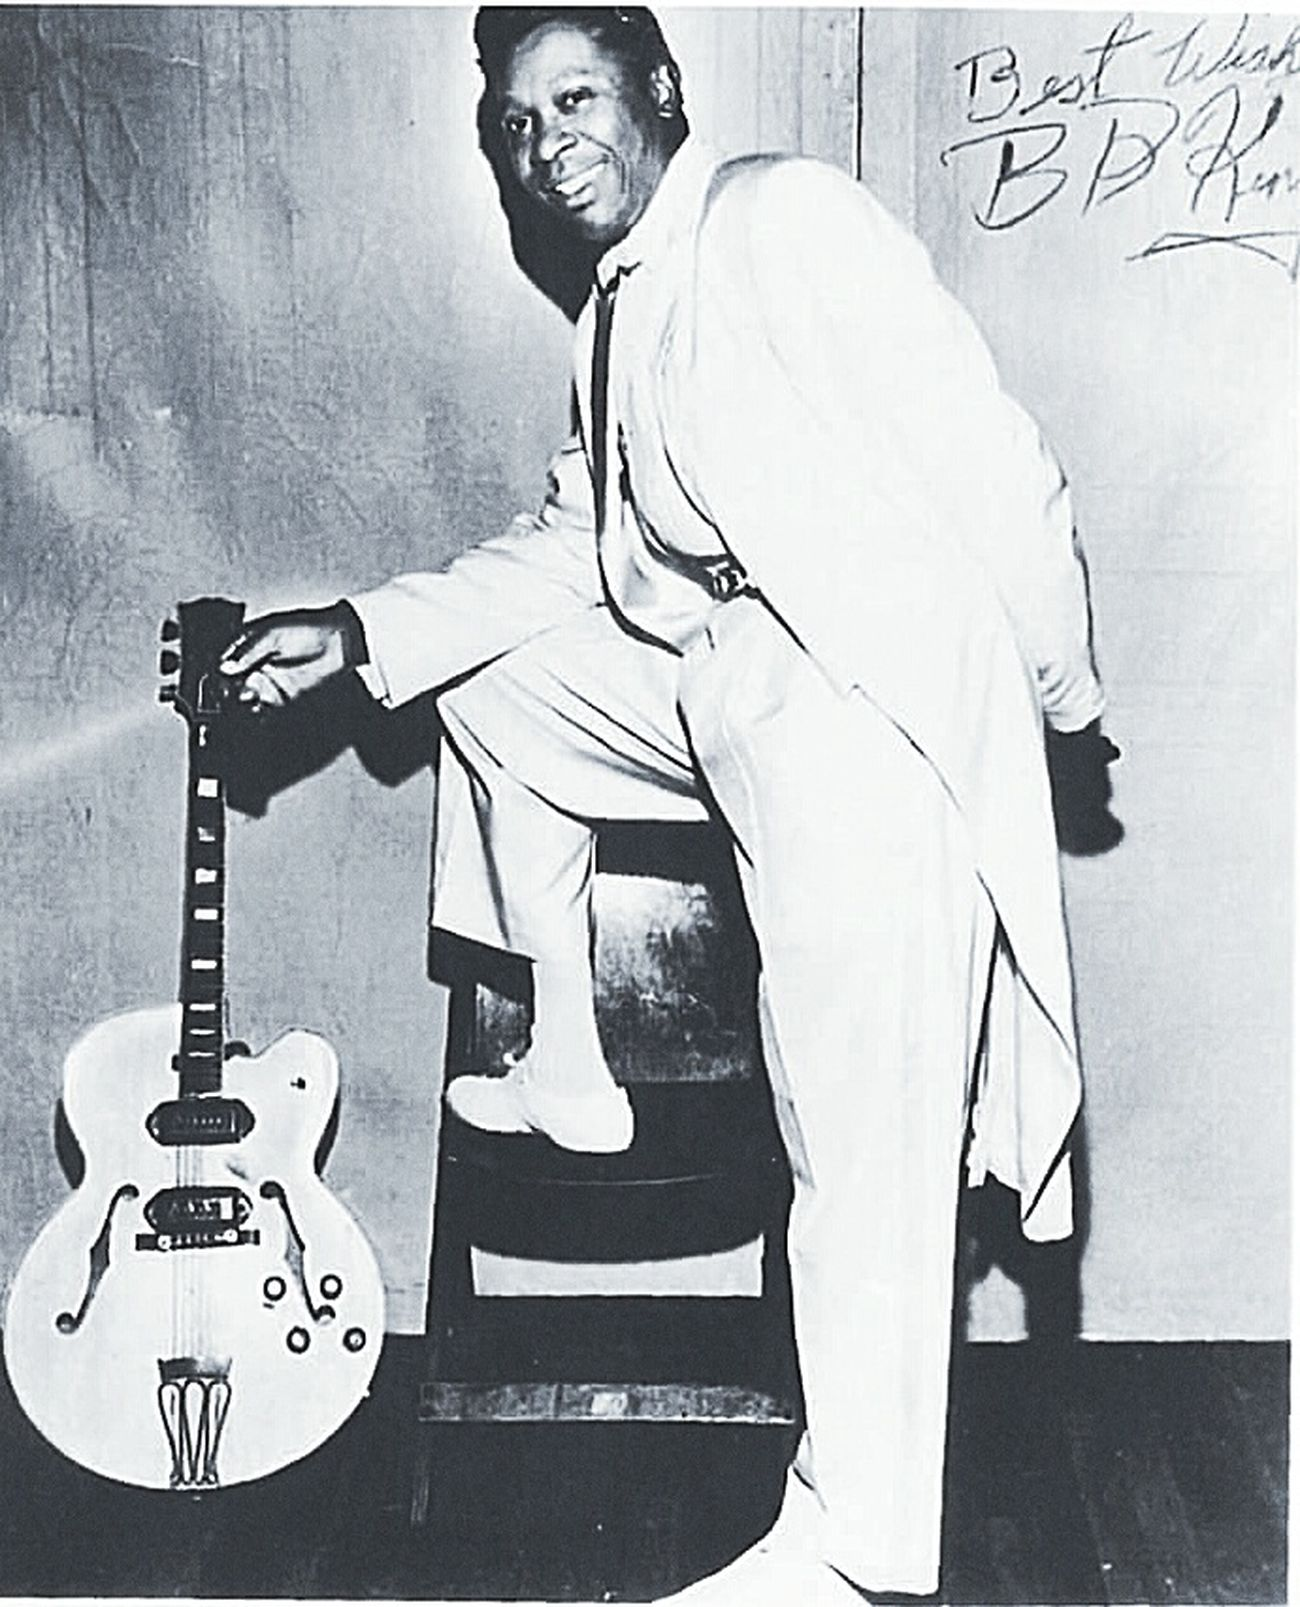 Bbking Bluesboy Rip BBKing Riding With The King Blues Jazz Soulbrotha Ledgend